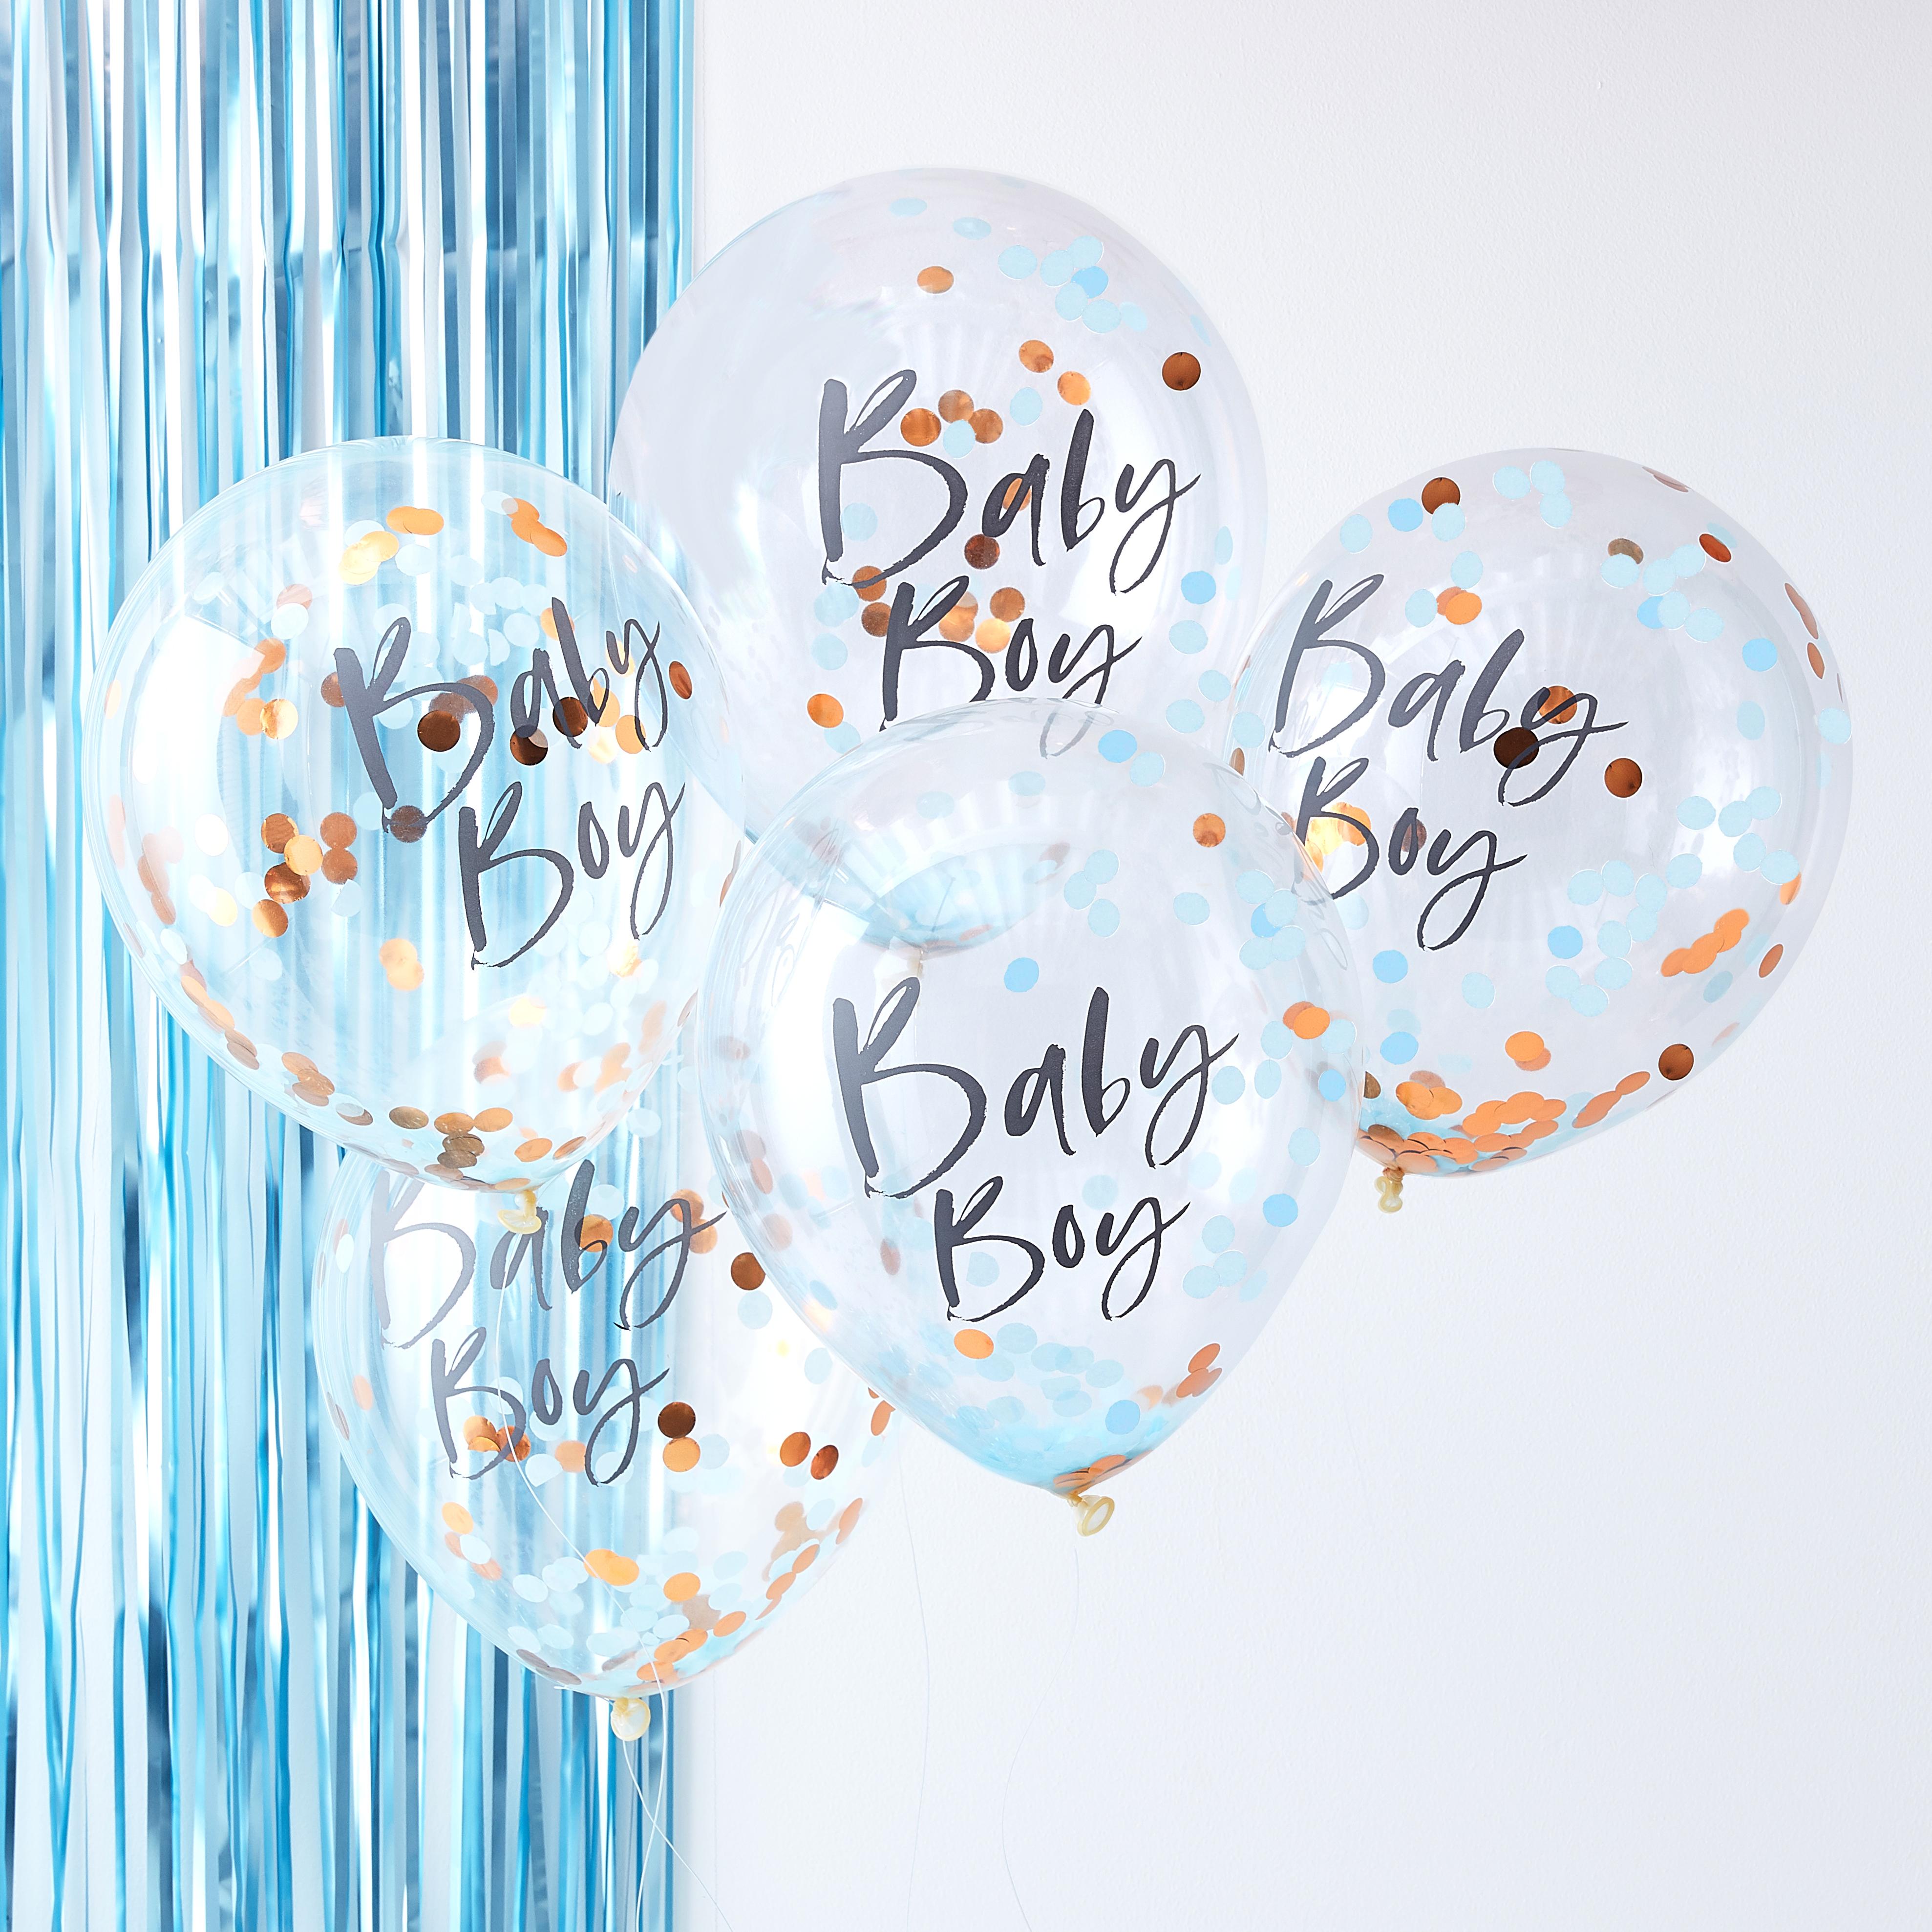 TW-802-Baby-Boy-Blue-Confetti-Balloons